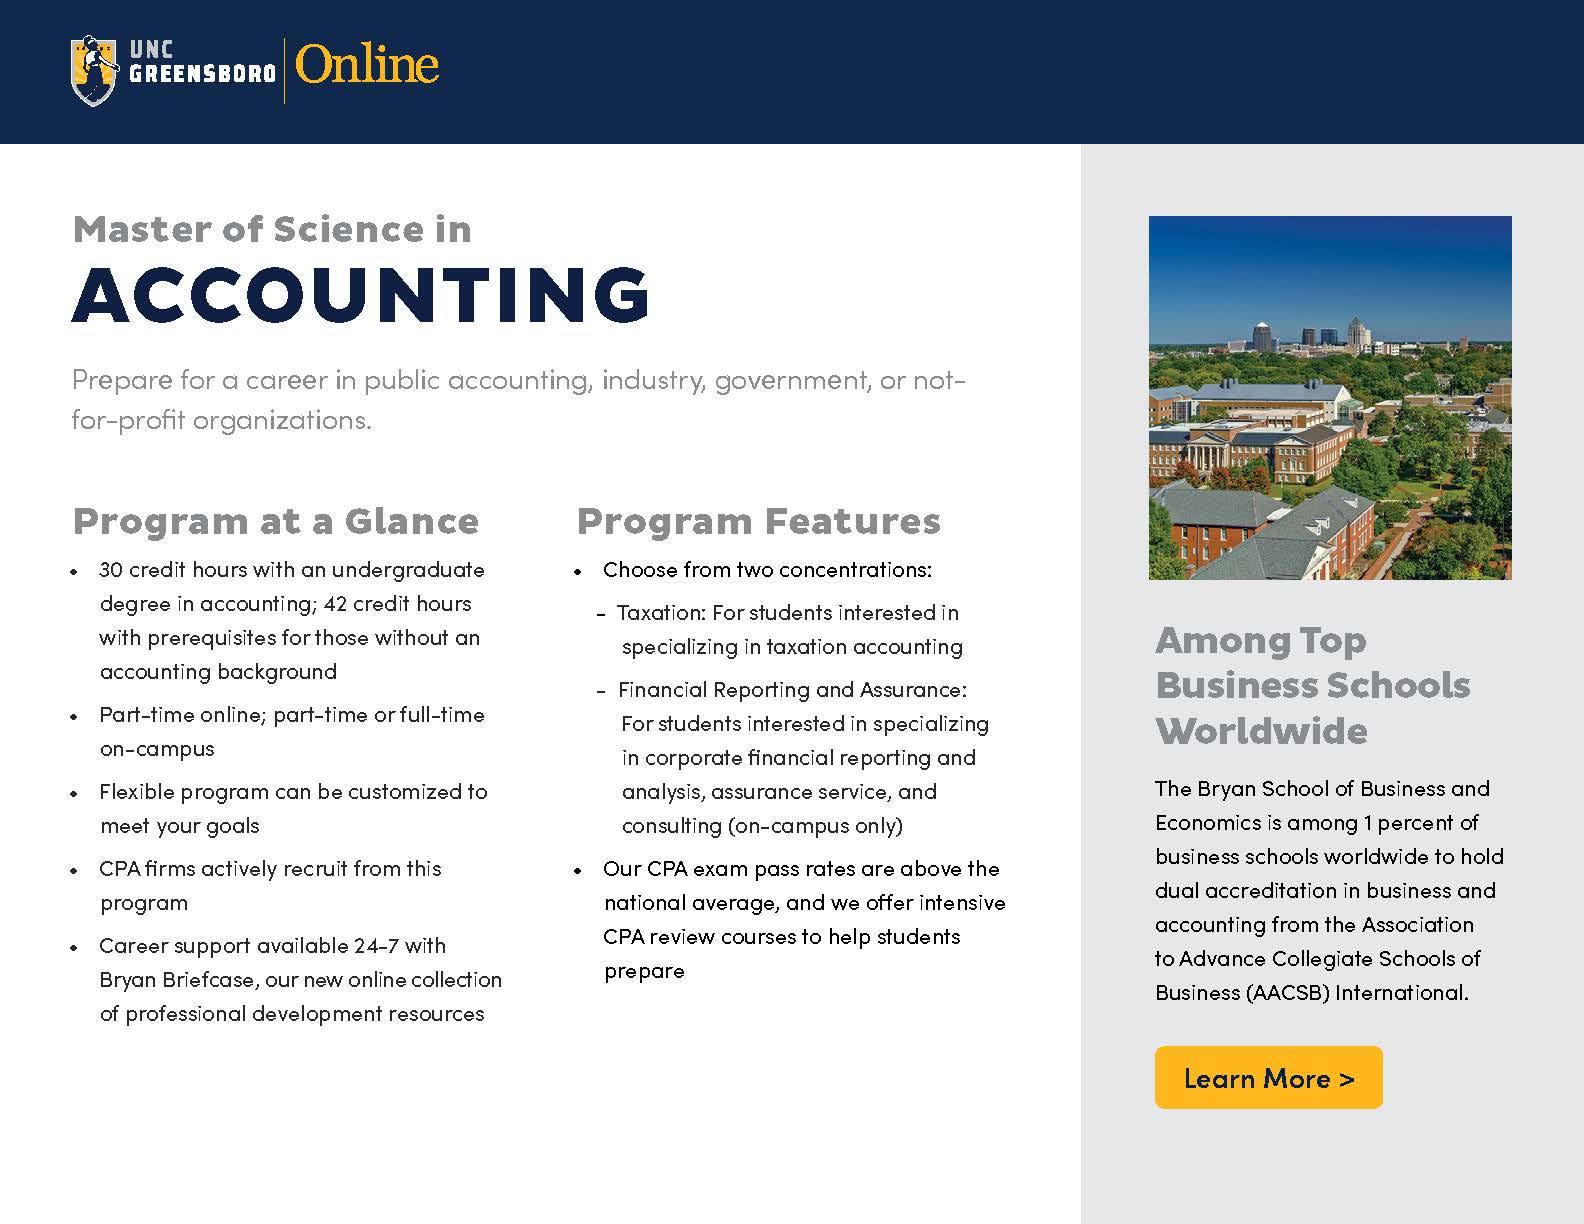 Master's in Accounting eBrochure Thumbnail